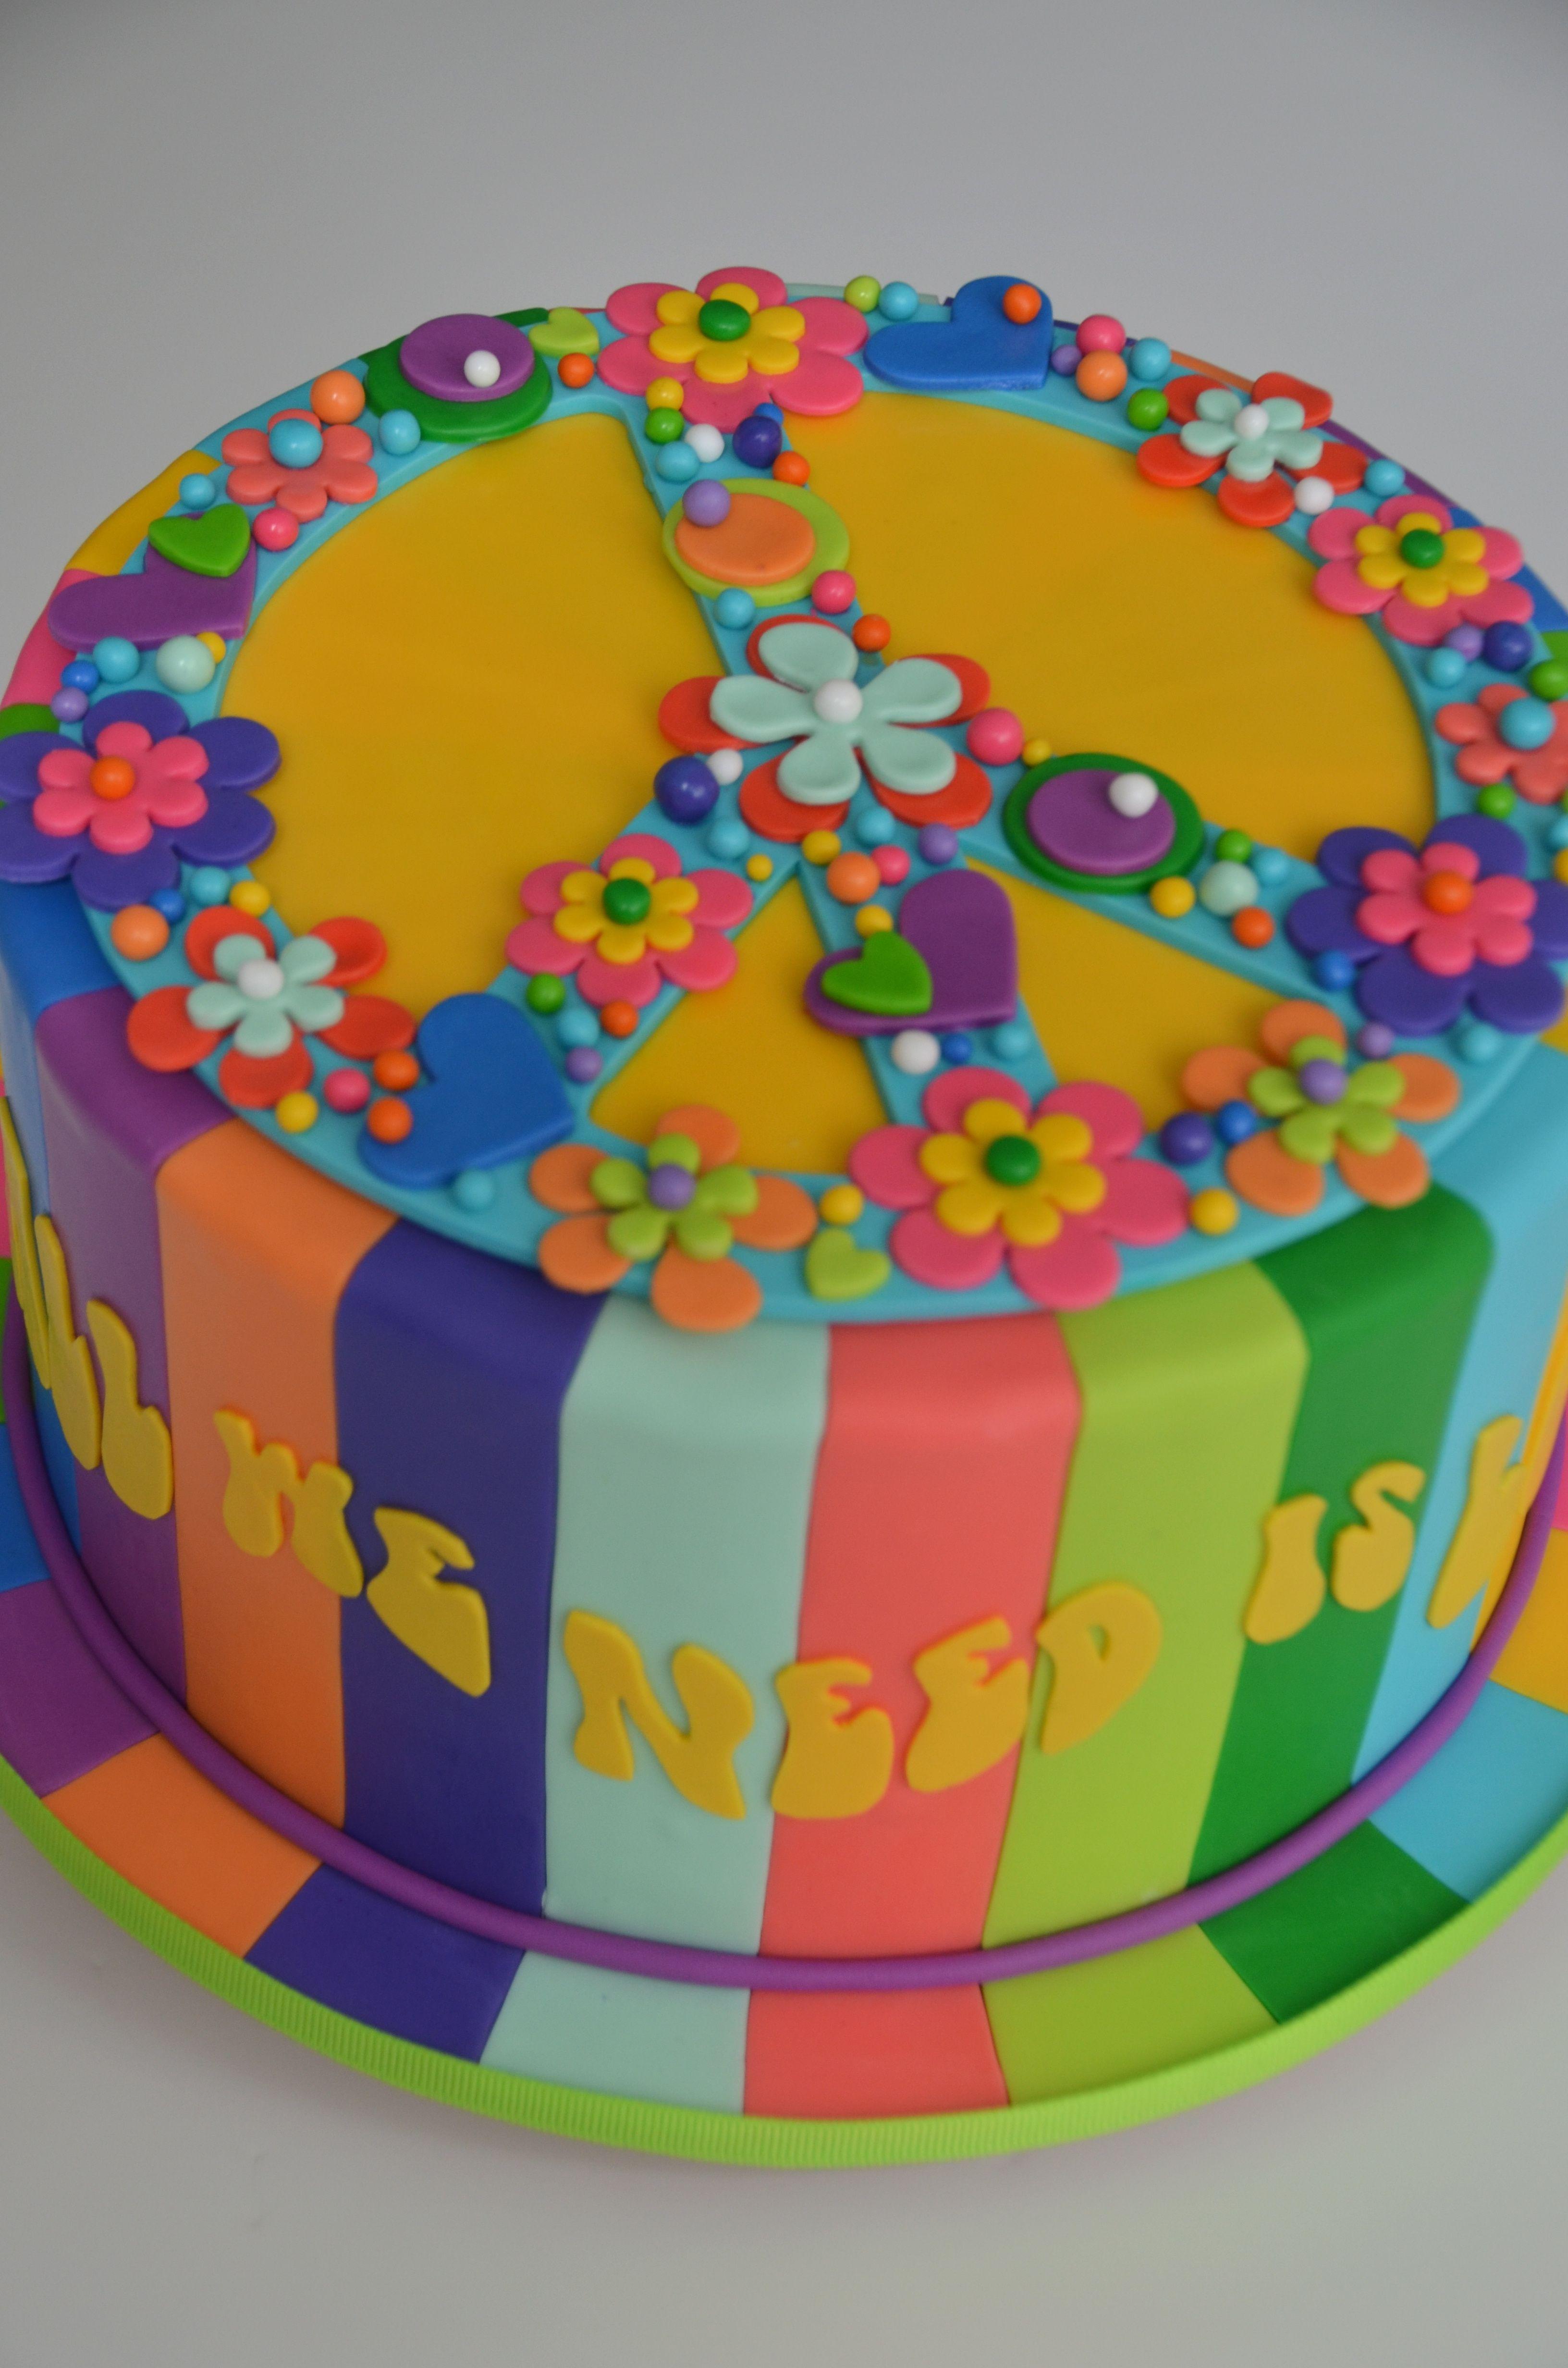 Pleasing Peace Cake Moxy Mx Peace Cake Pretty Cakes Cake Personalised Birthday Cards Cominlily Jamesorg